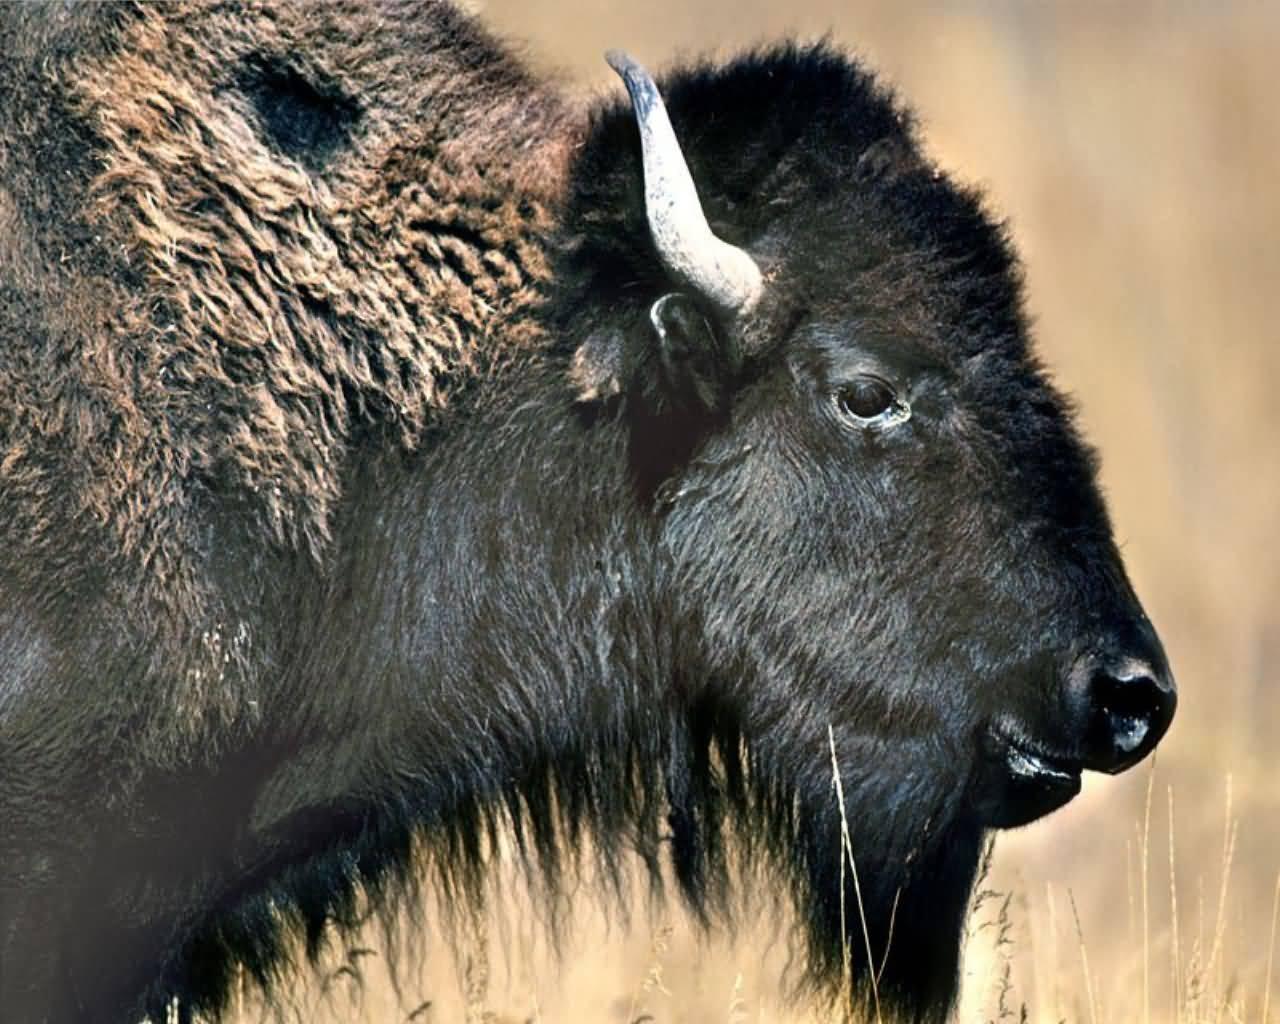 Animal Life In Temperate Grassland